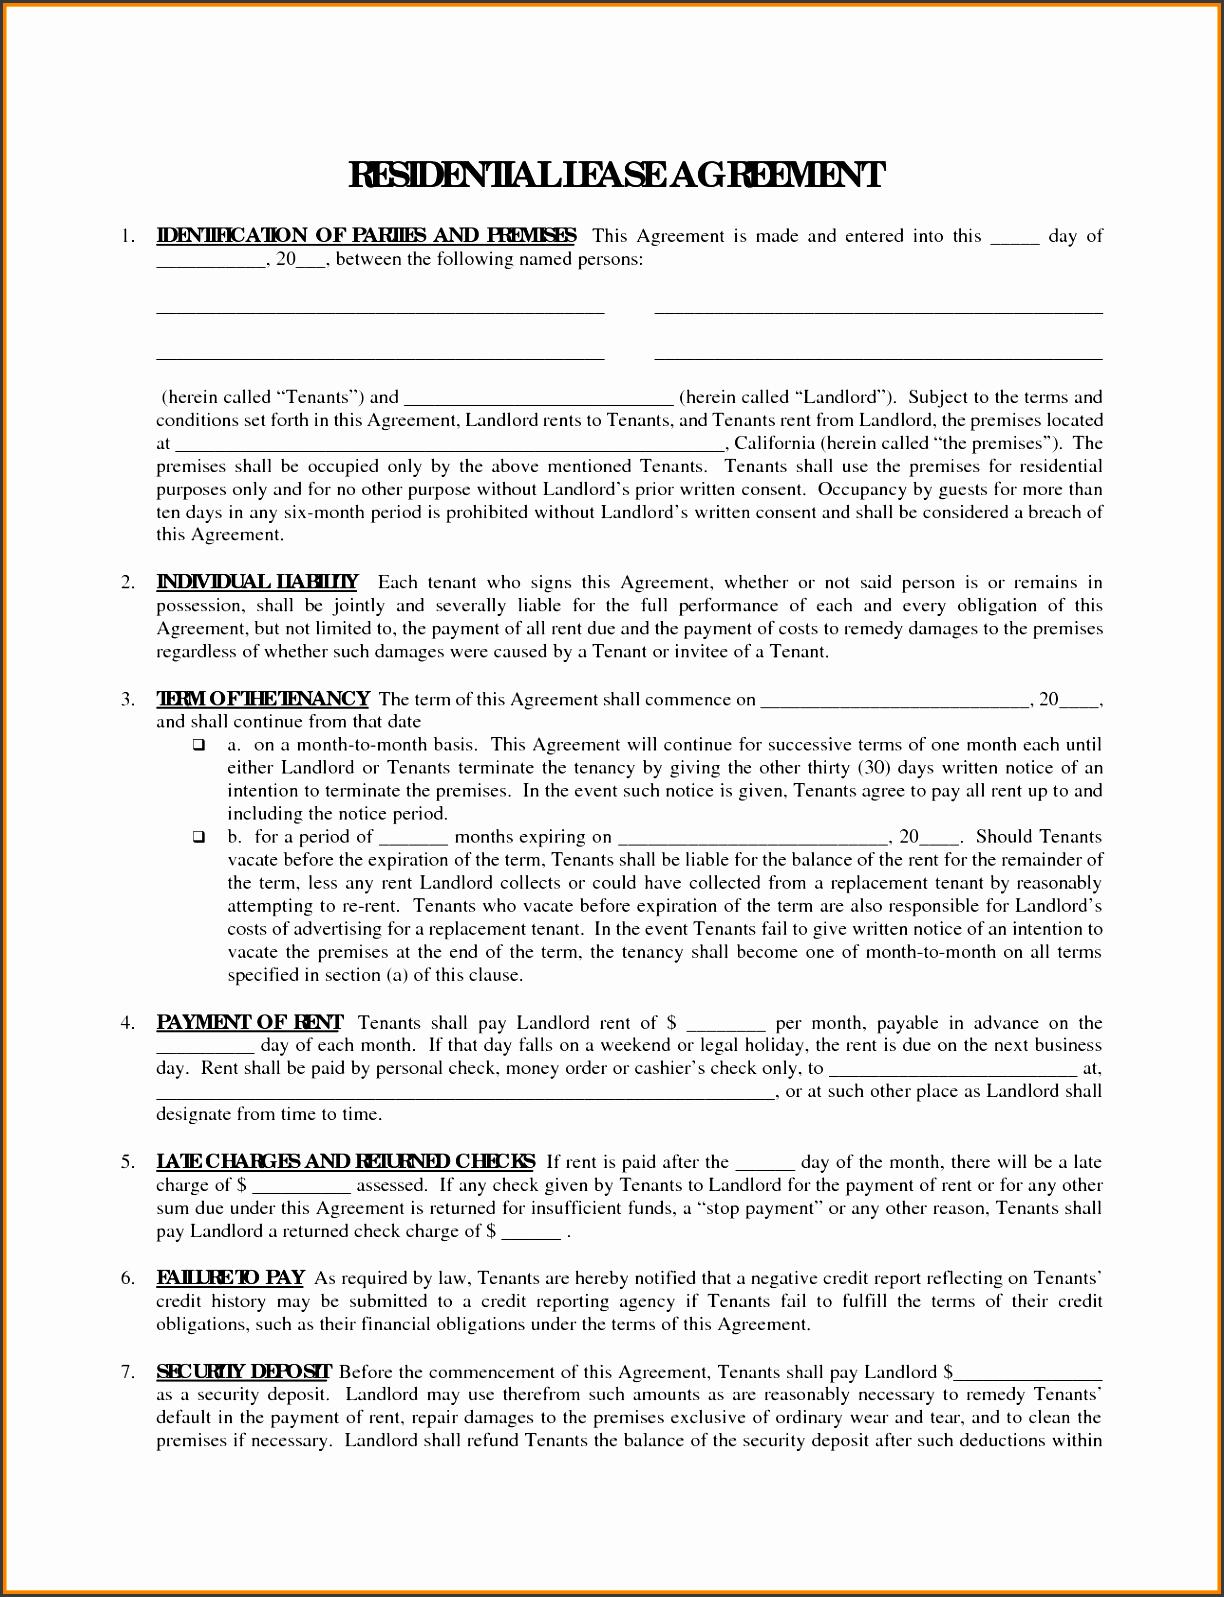 8 rent lease agreement form newborneatingchart rent lease agreement form free printable rental lease agreement form